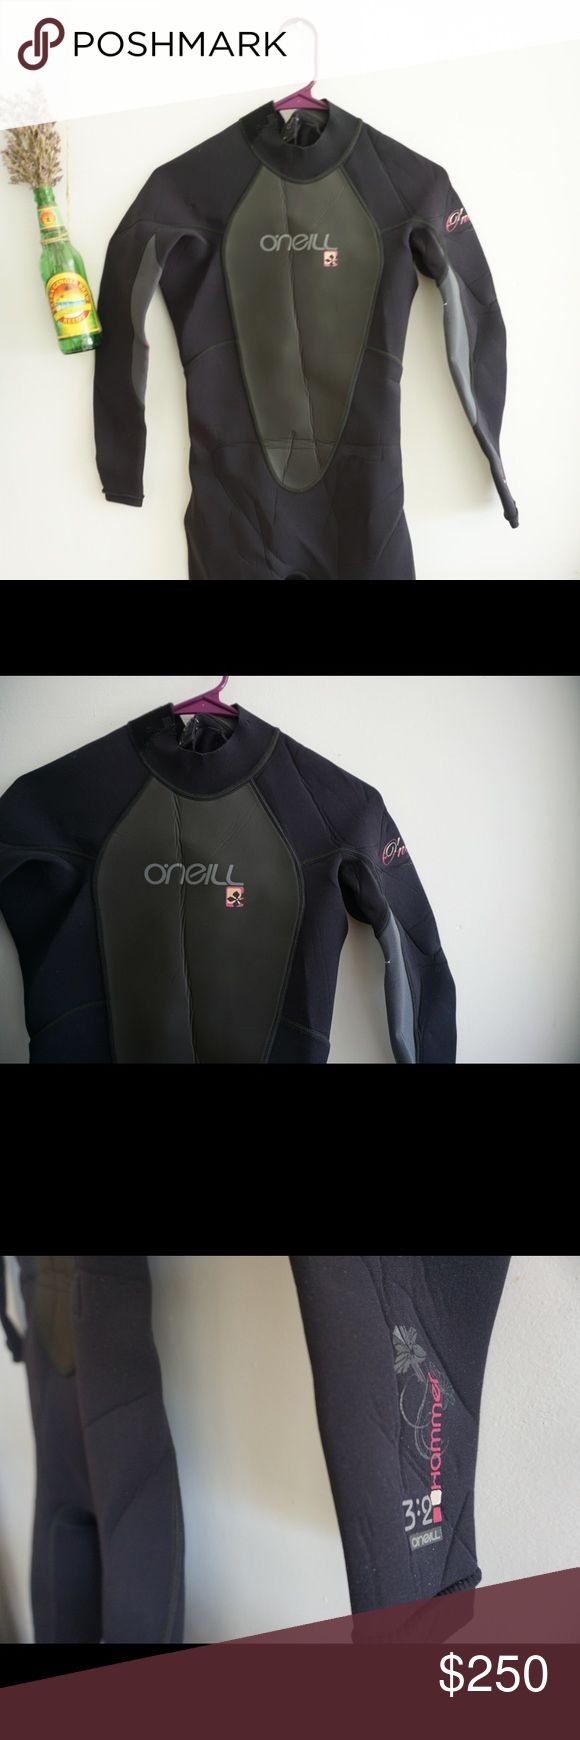 O'Neill full length wetsuit Full length black O'Neill wetsuit O'Neill Swim